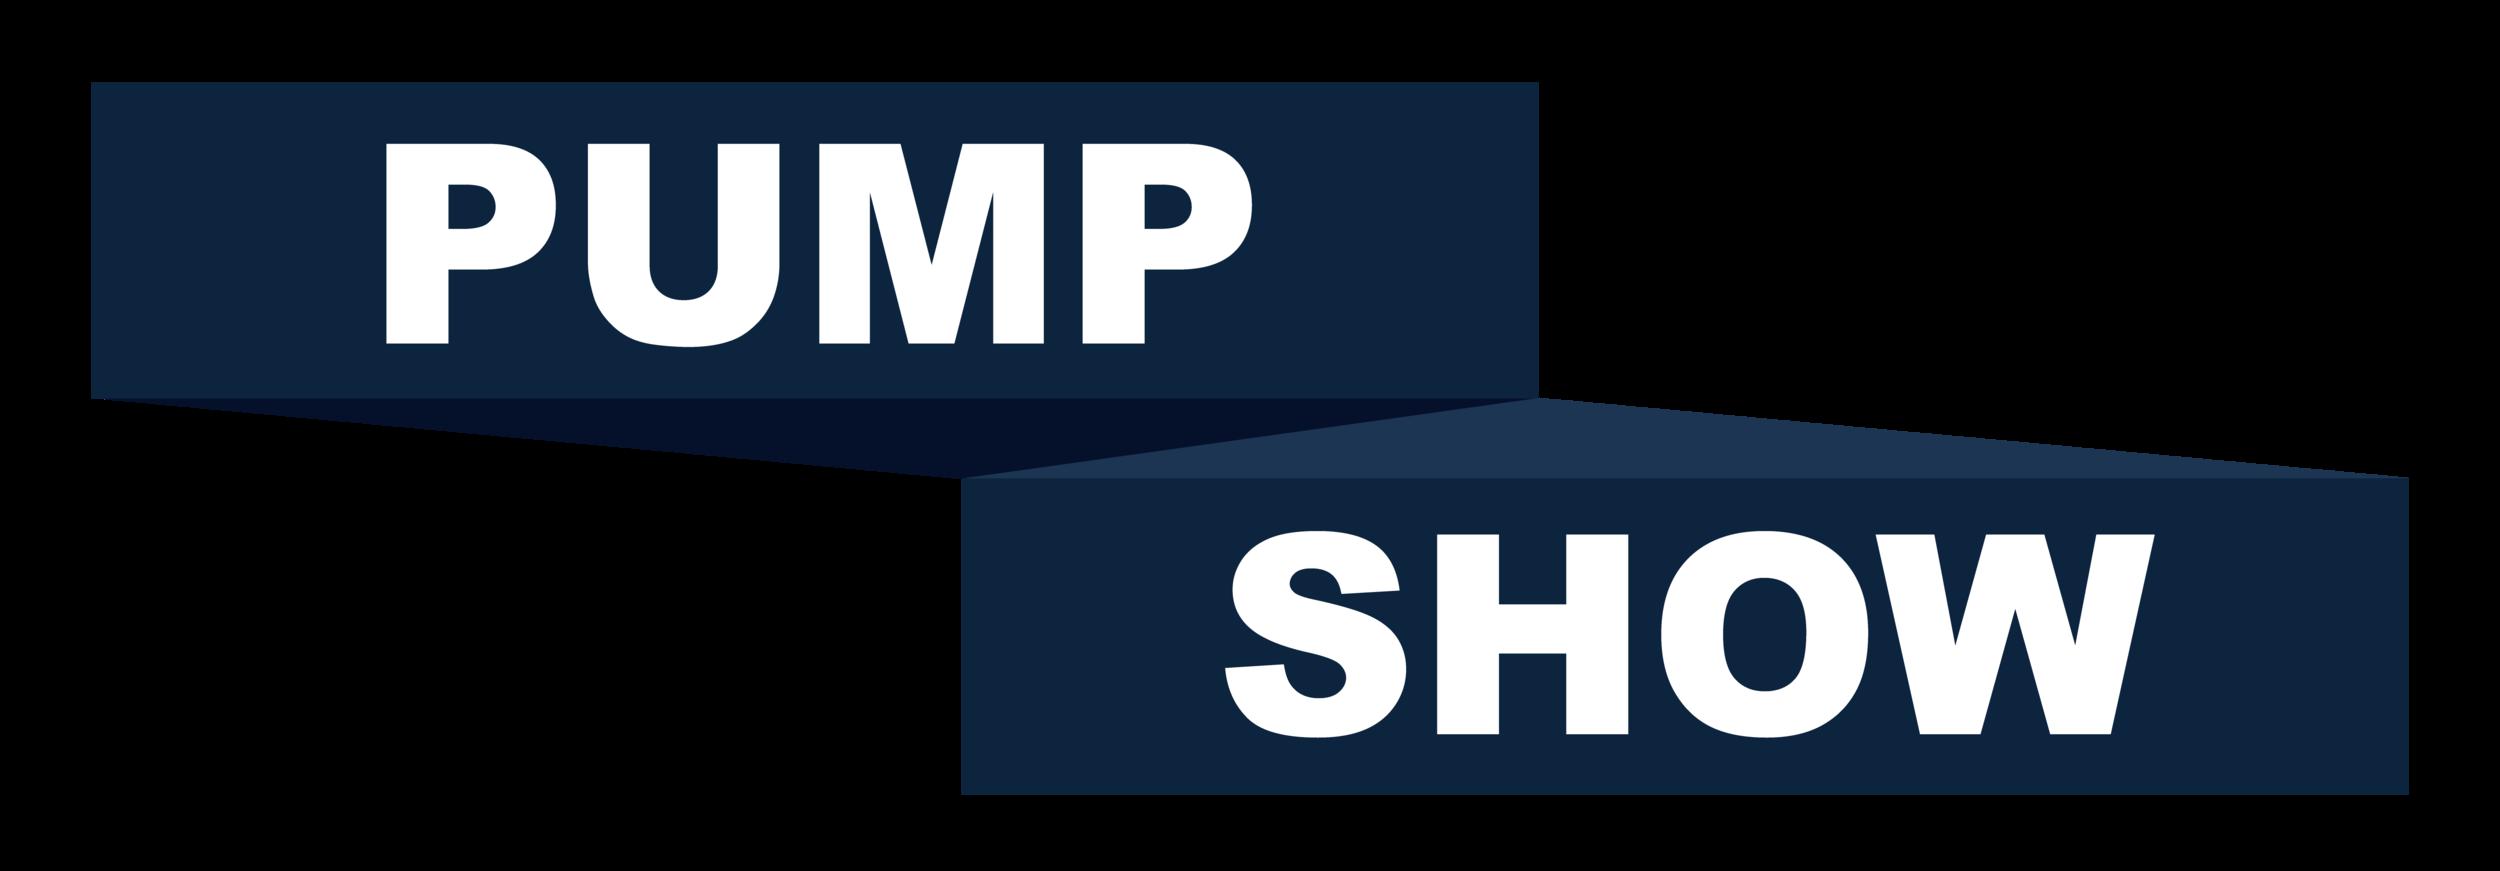 Pump-Show-Name.png